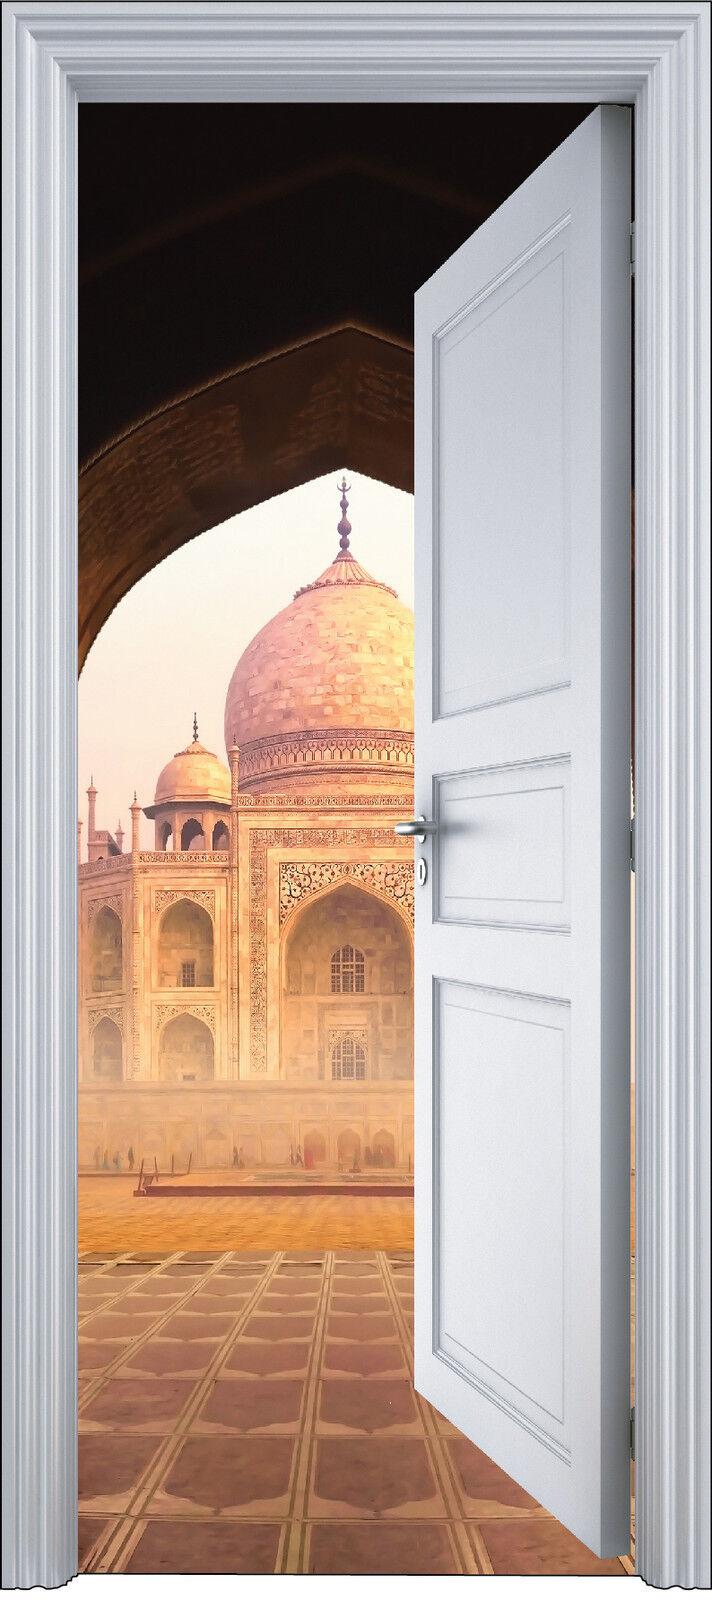 Adhesivo Puerta Trompa Trampantojo Decoración Templo Taj Mahal 90x200 cm Ref